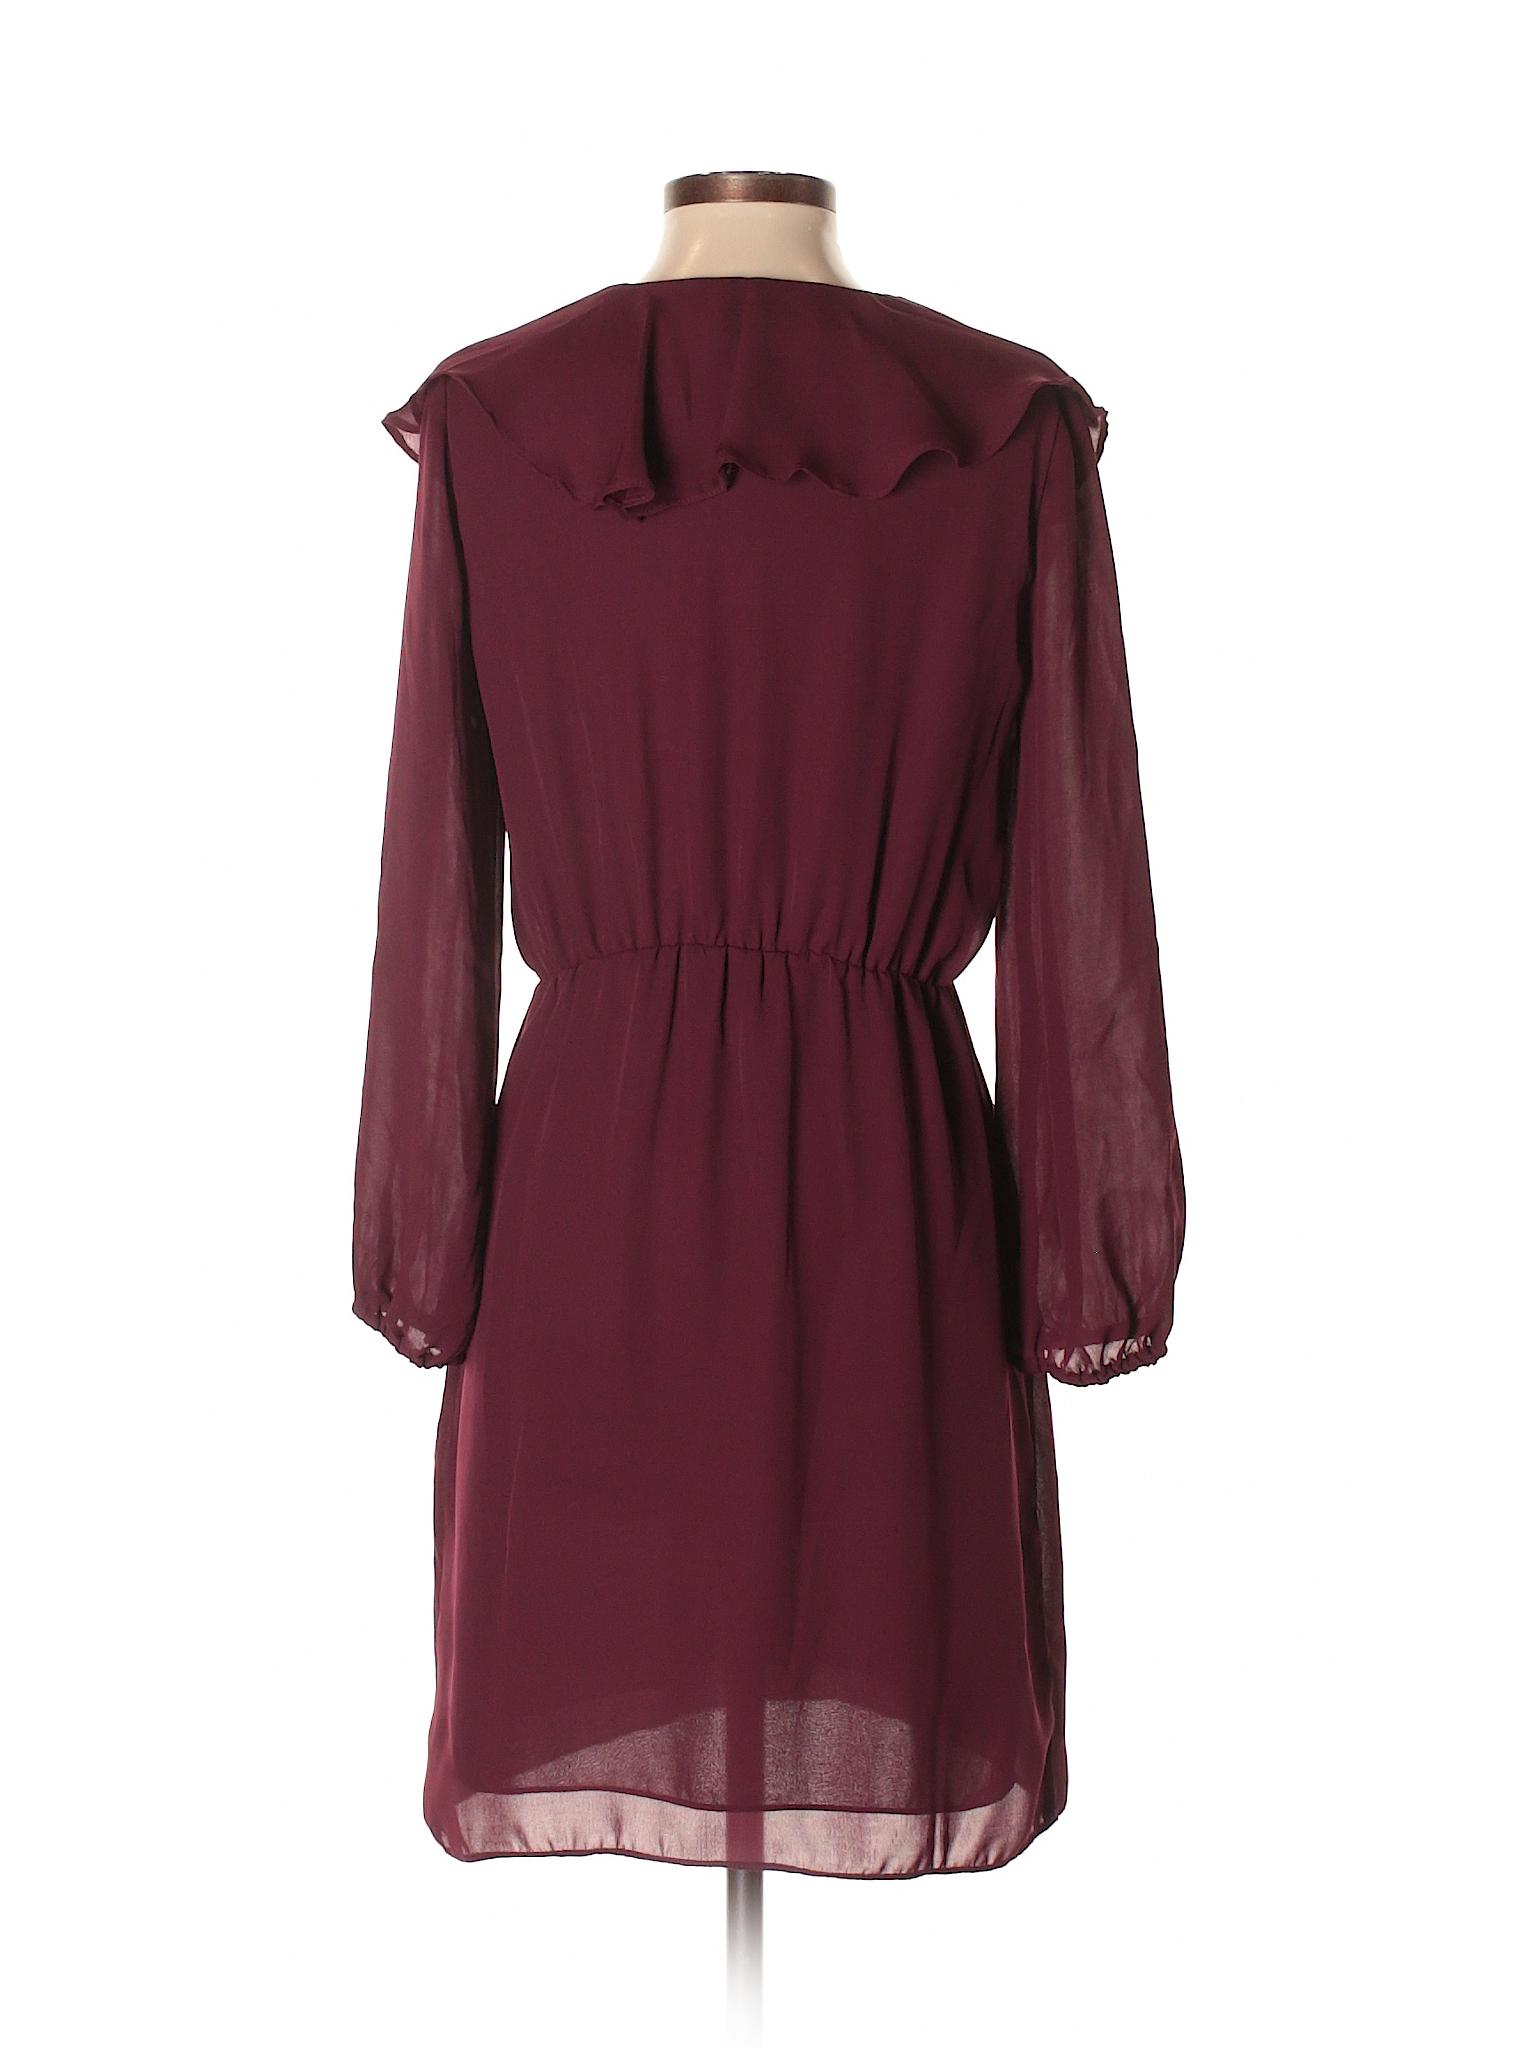 winter Casual Dress Boutique Amanda Uprichard 46w4dR